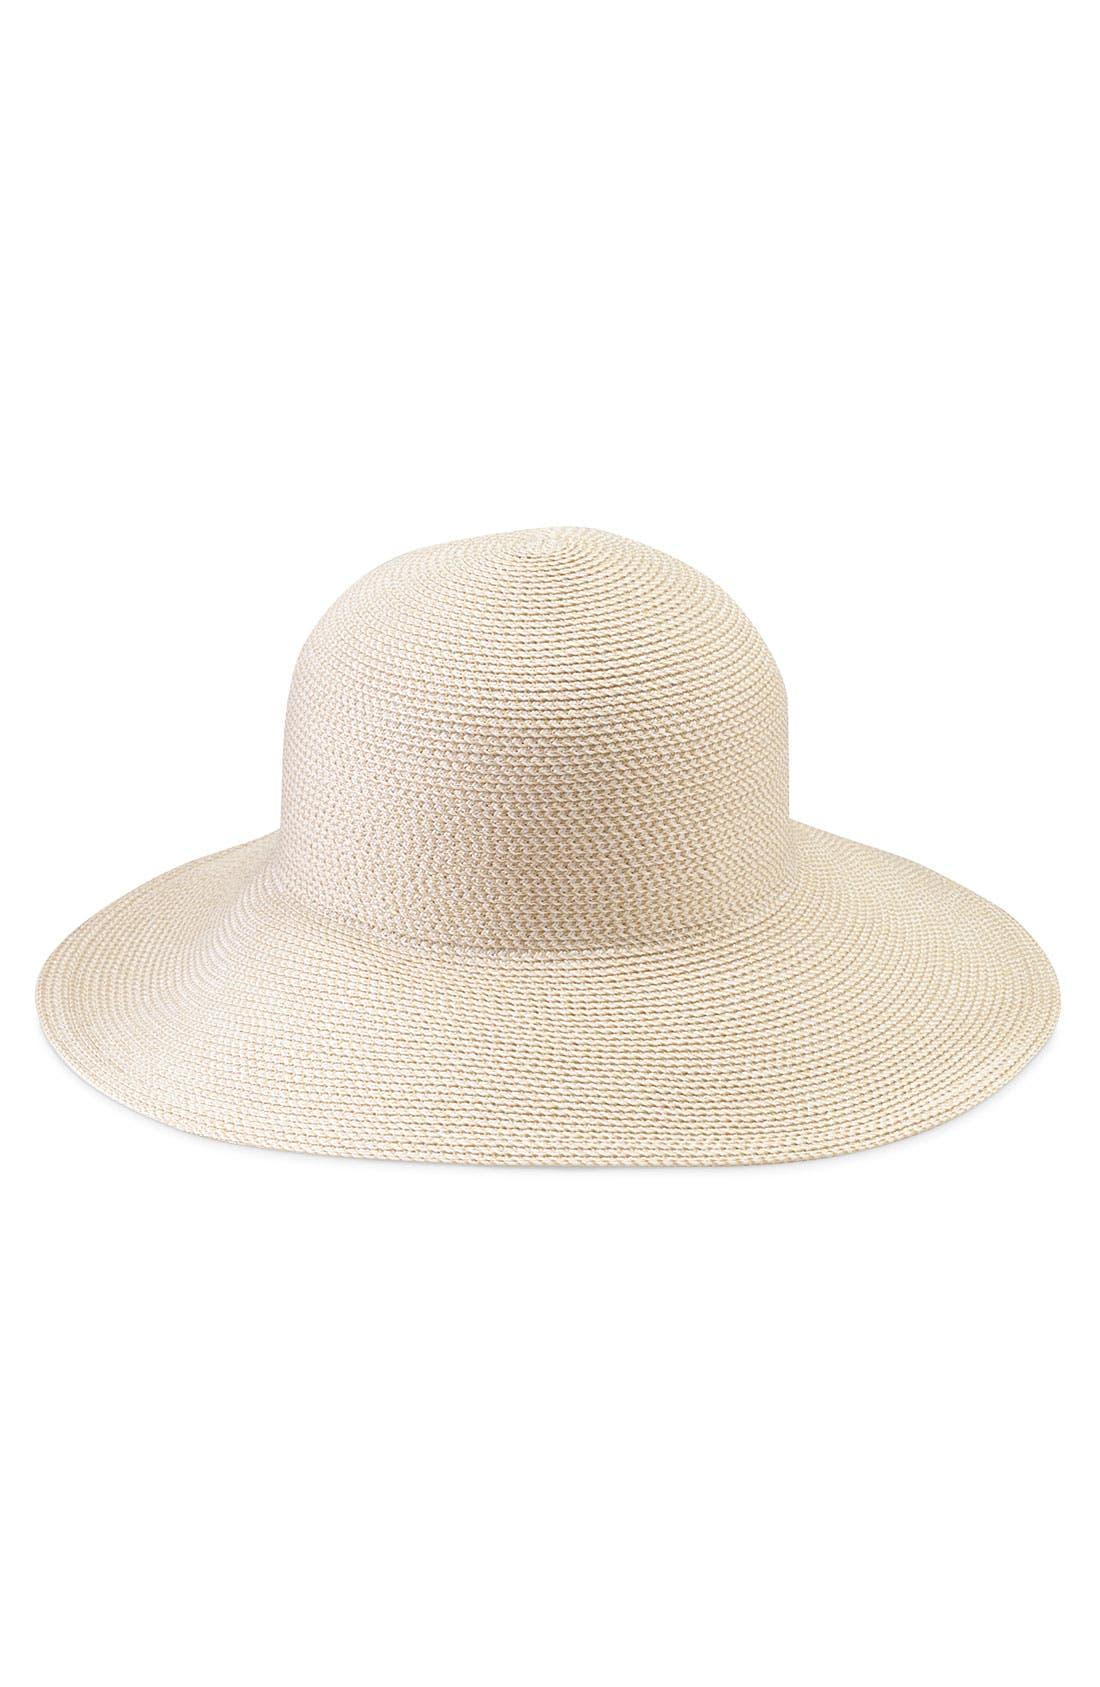 ERIC JAVITS Squishee<sup>®</sup> IV Wide Brim Hat